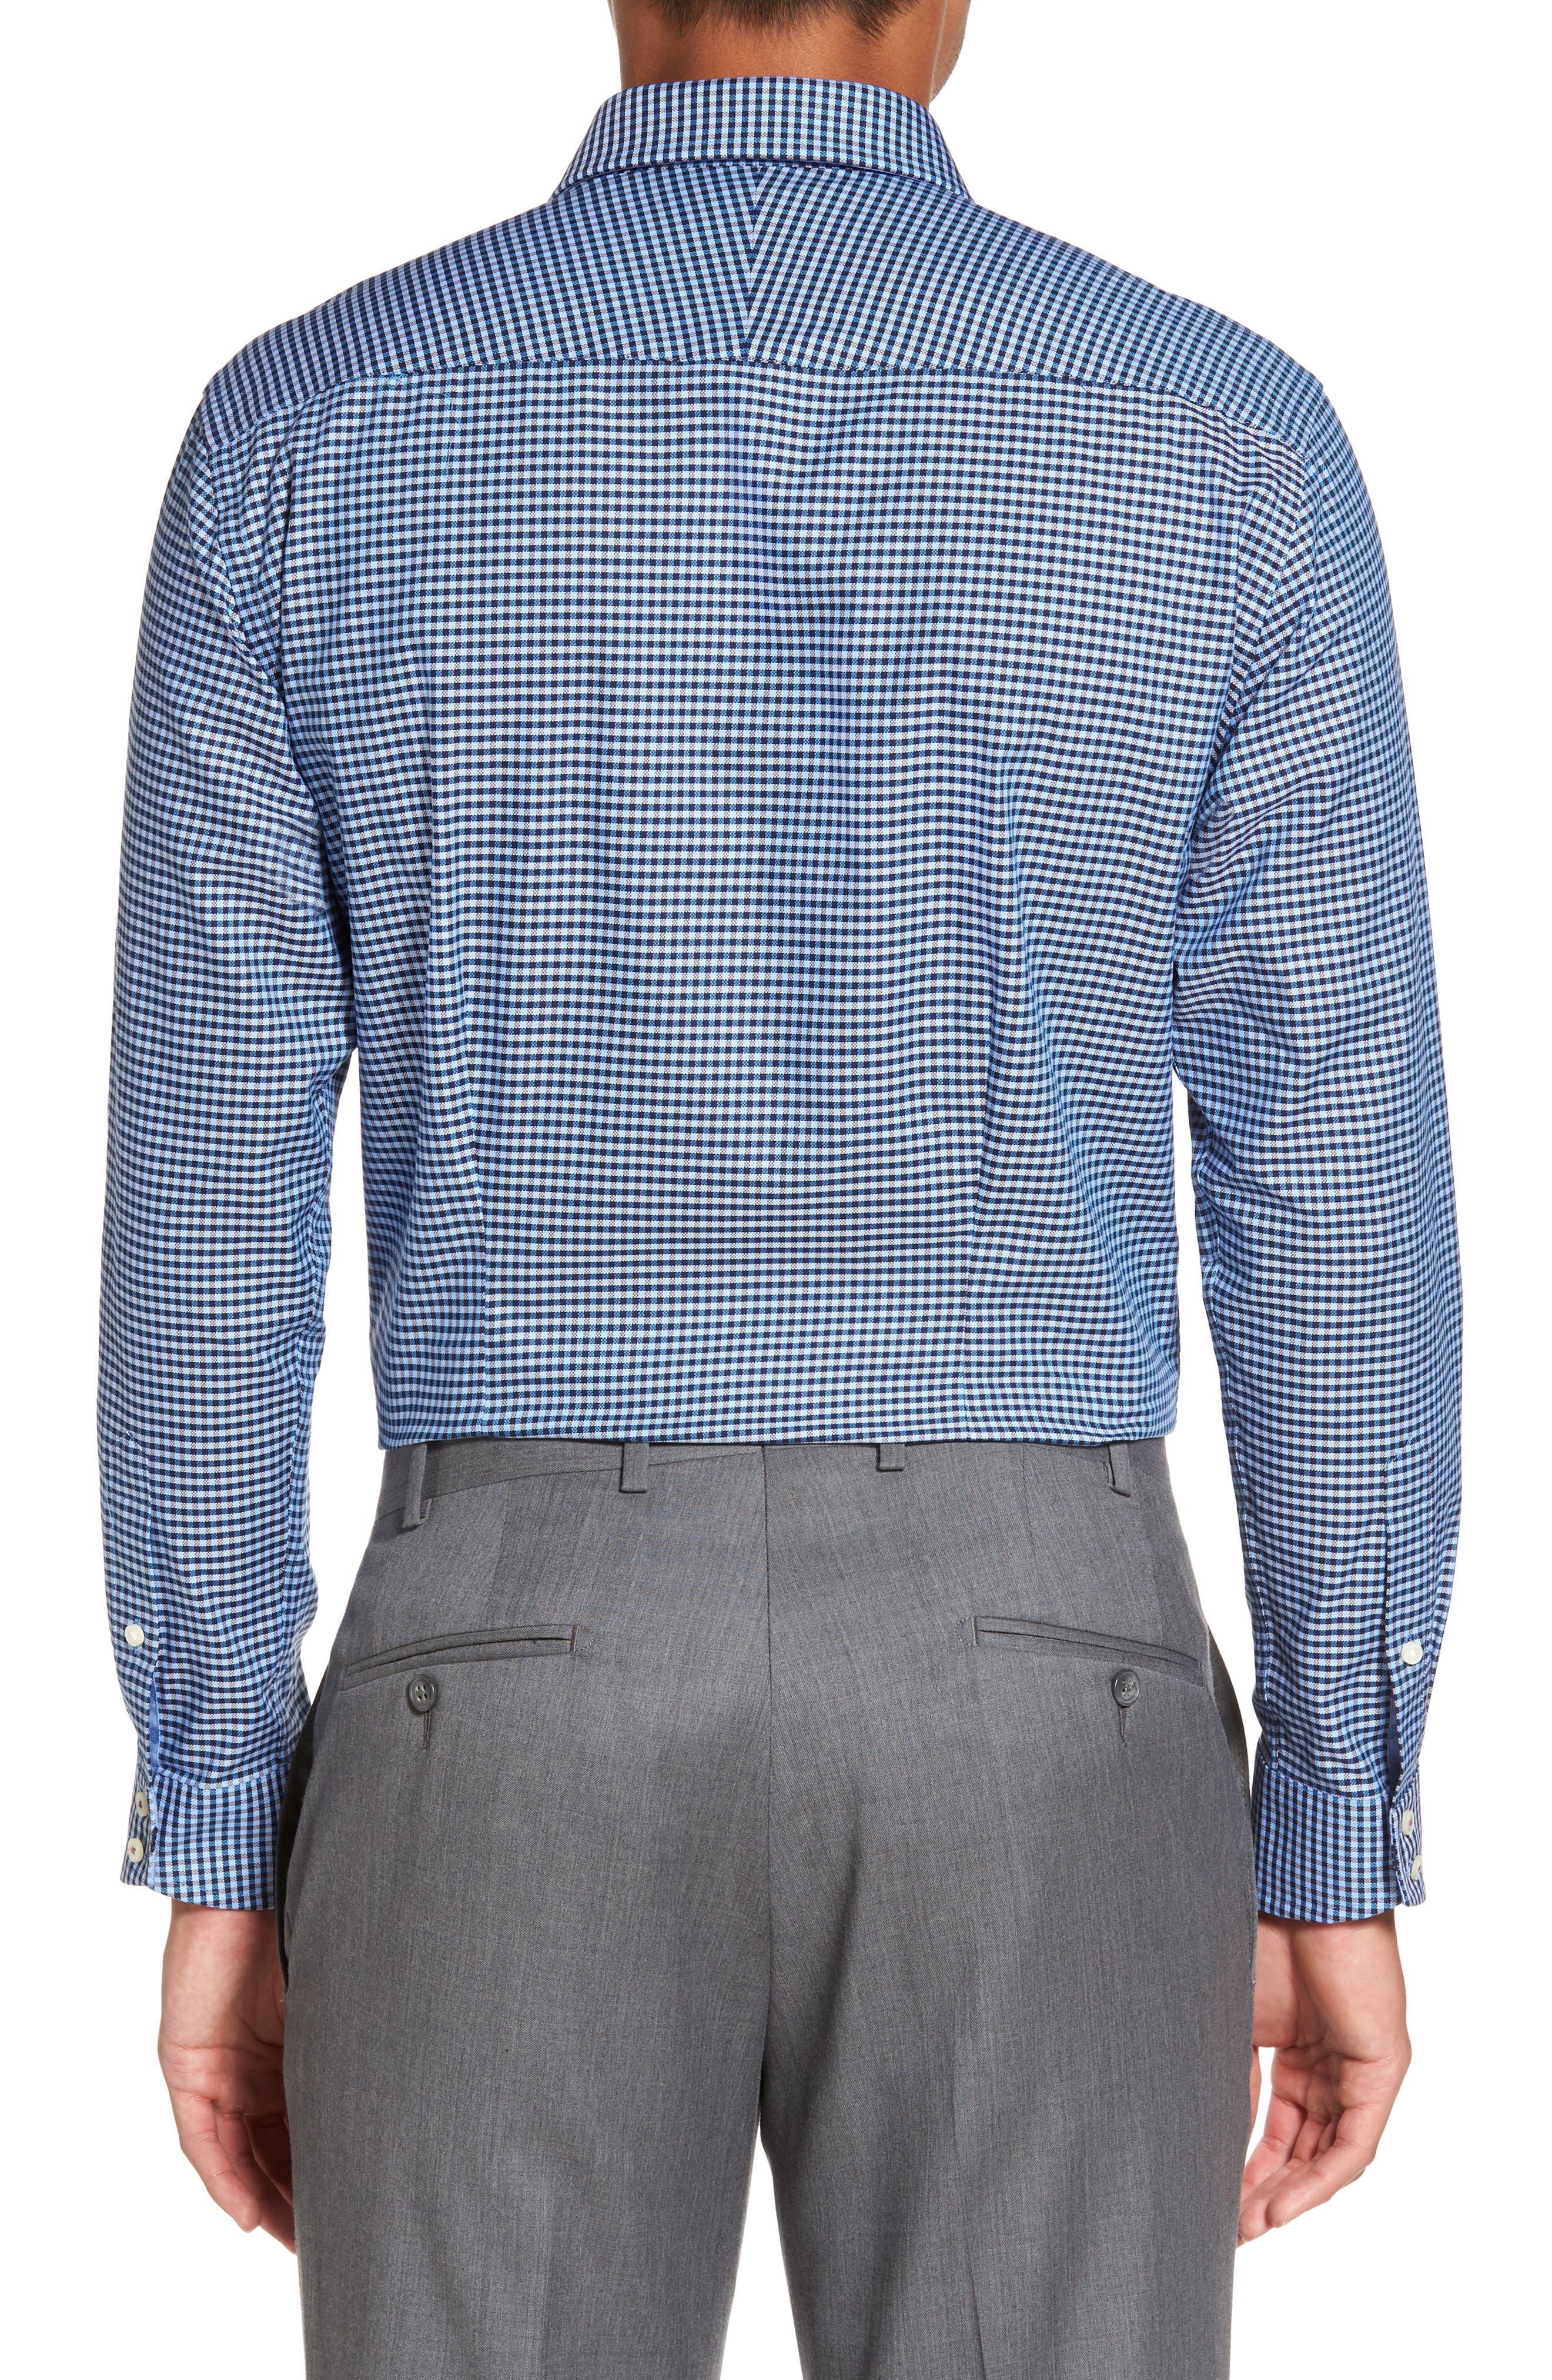 Endurance Sterling Trim Fit Dress Shirt,                             Alternate thumbnail 3, color,                             Blue